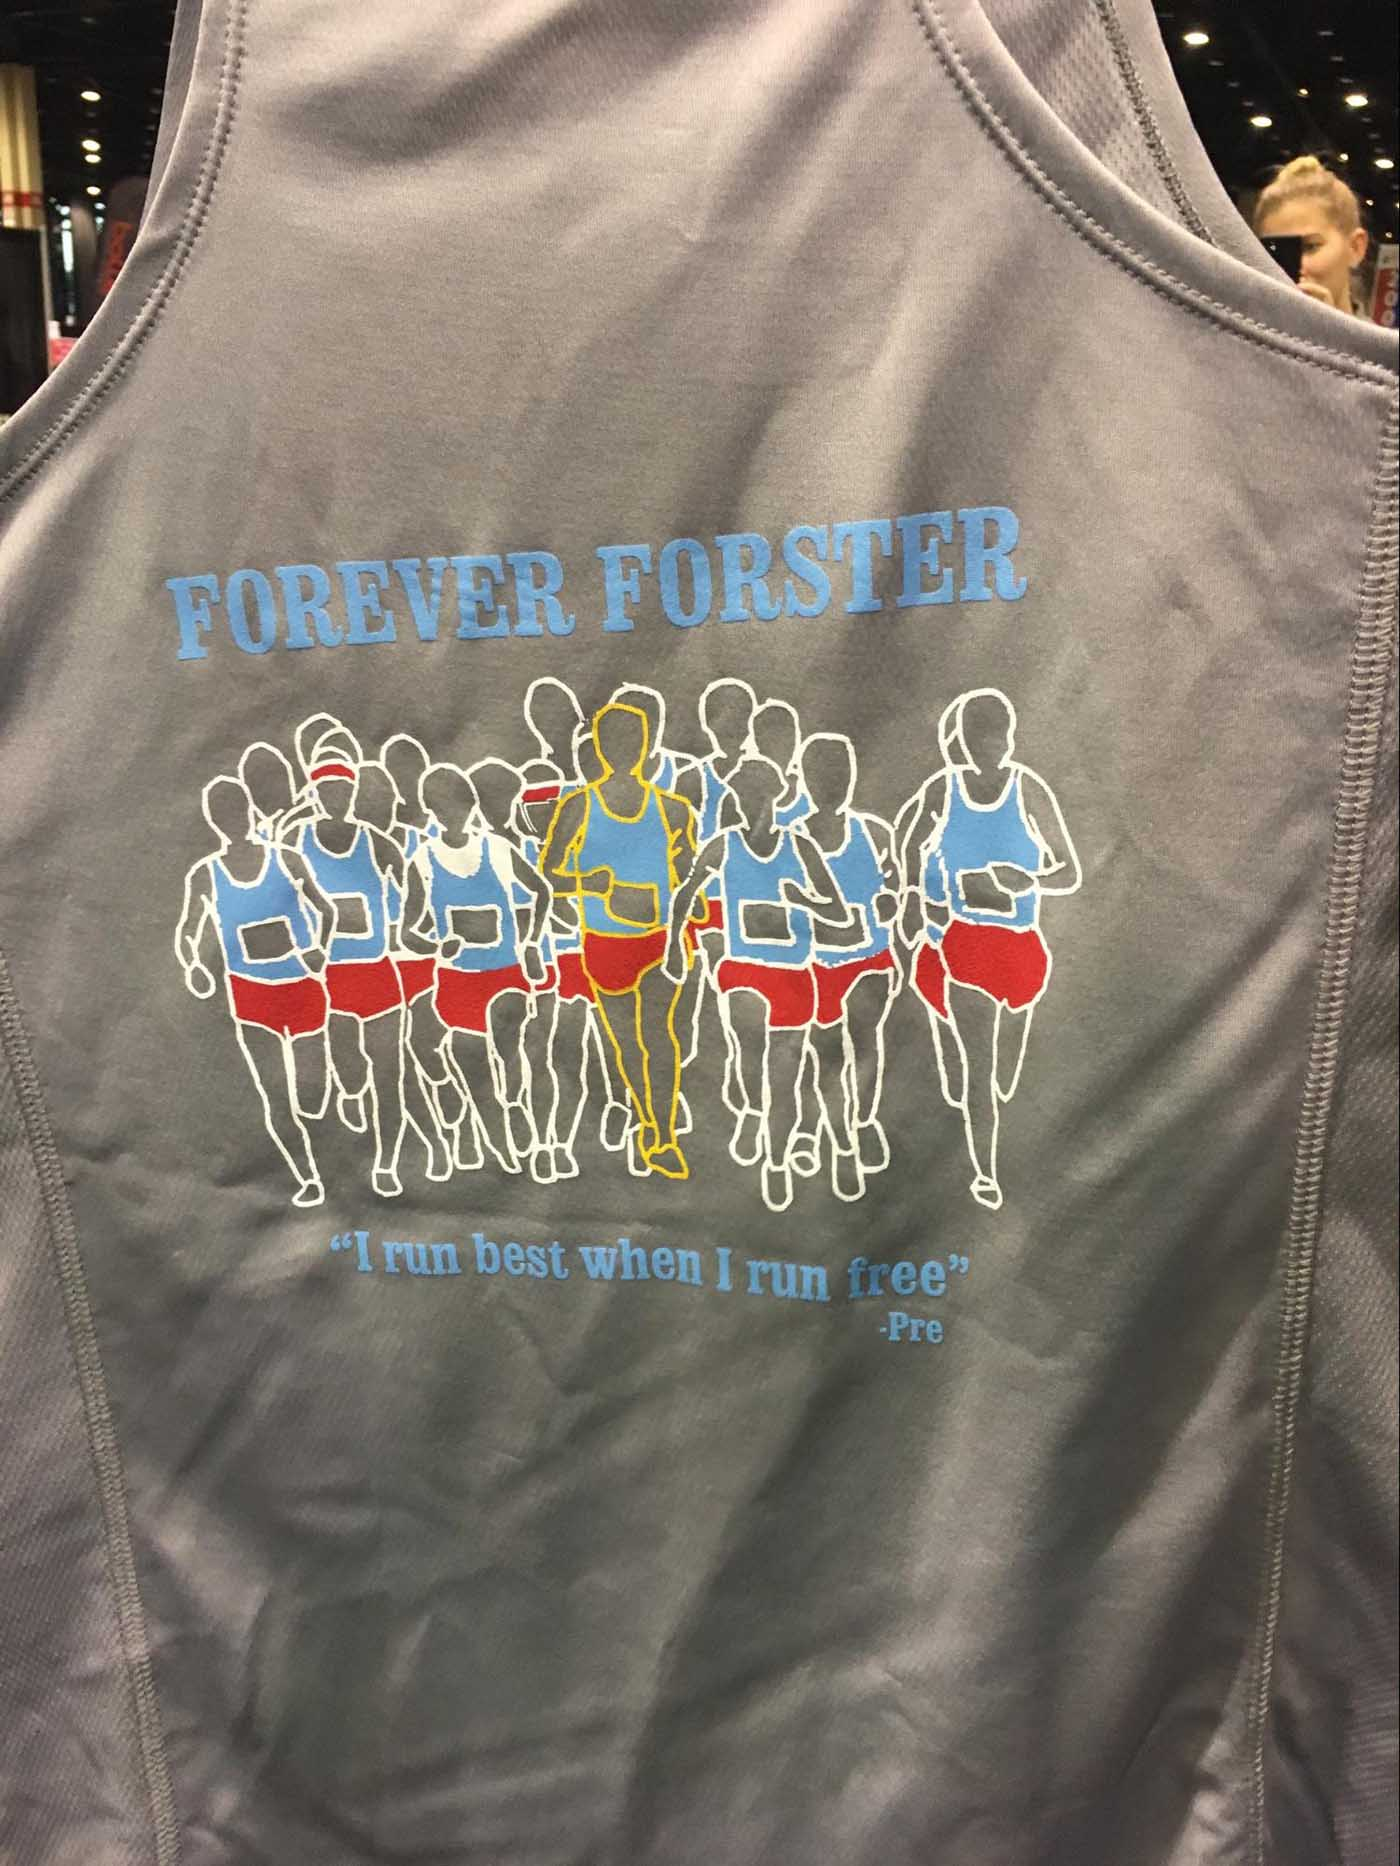 asweatlife_chicago-marathoners-honor-a-fallen-friend_3